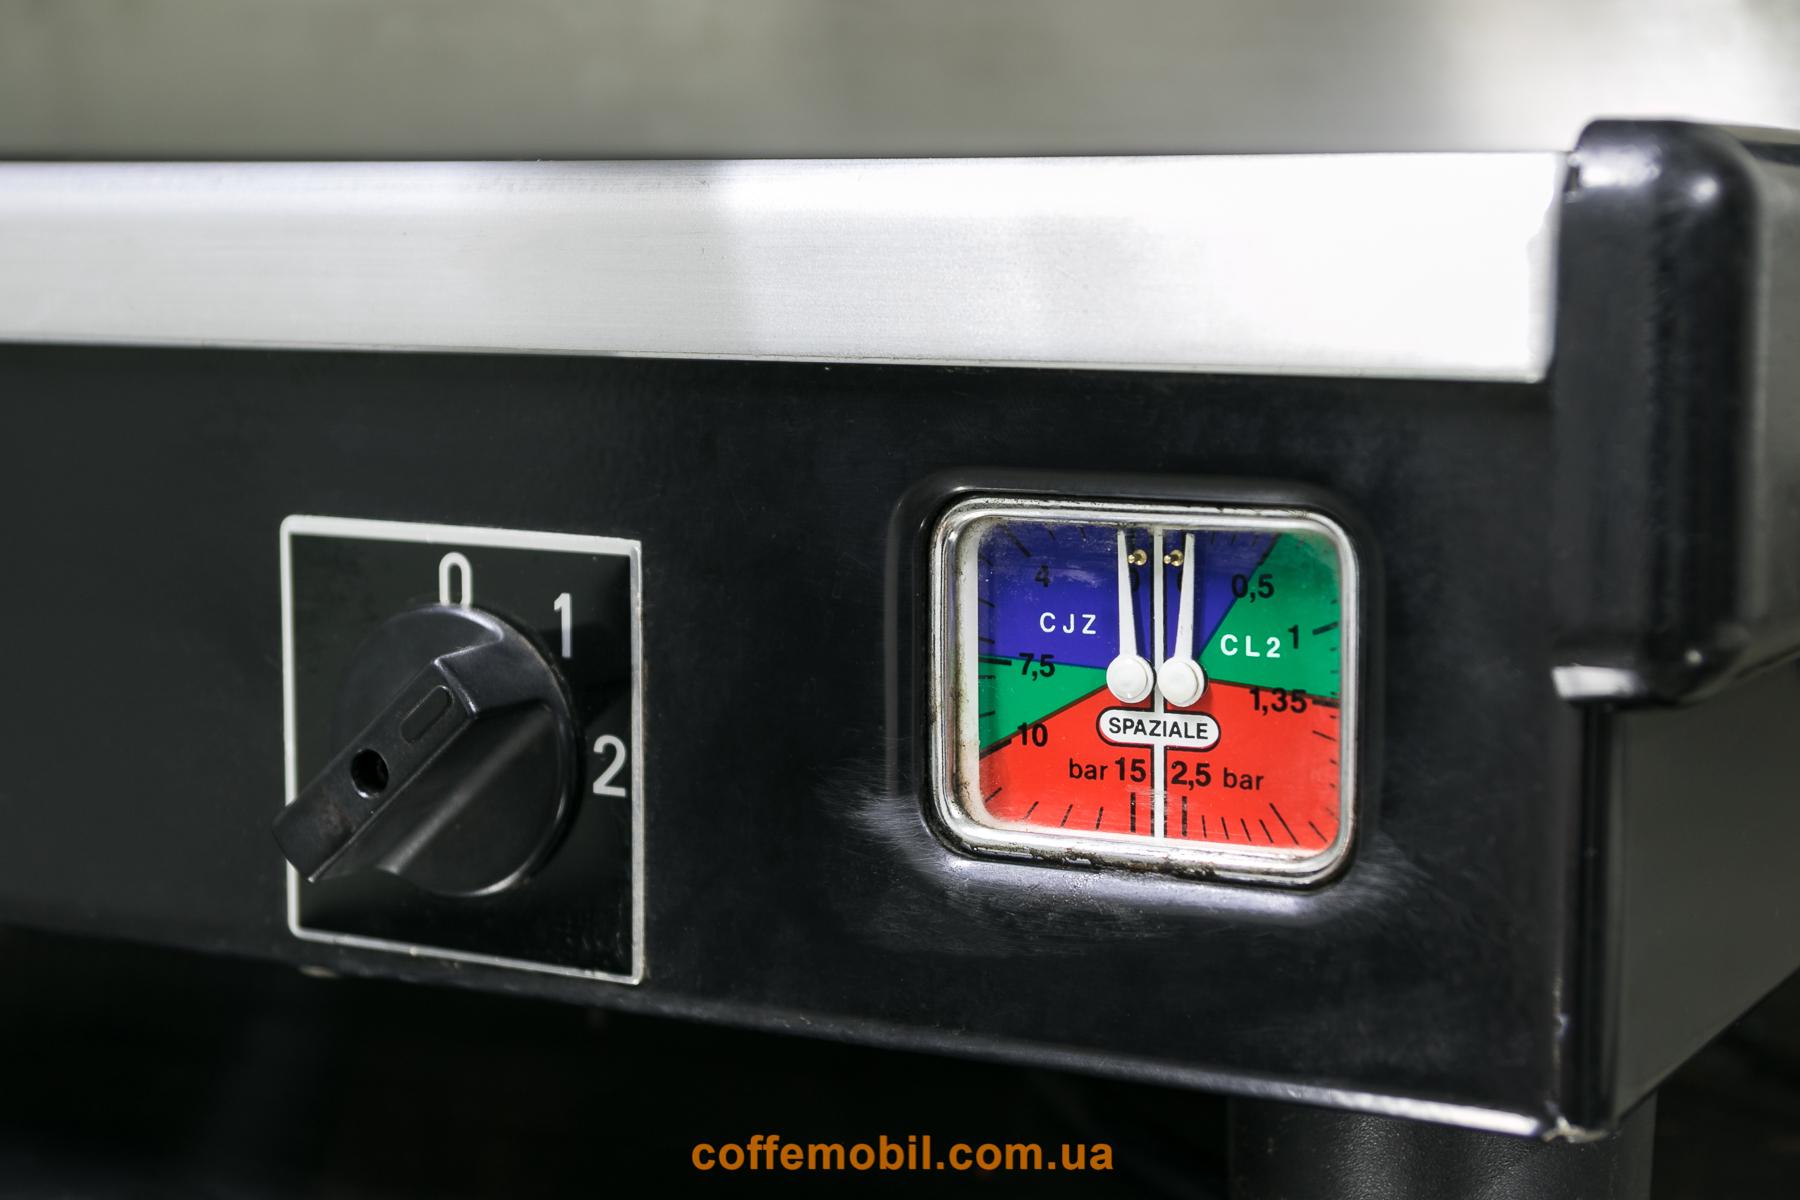 кофеварка Spaziale NewEk 2gr купить